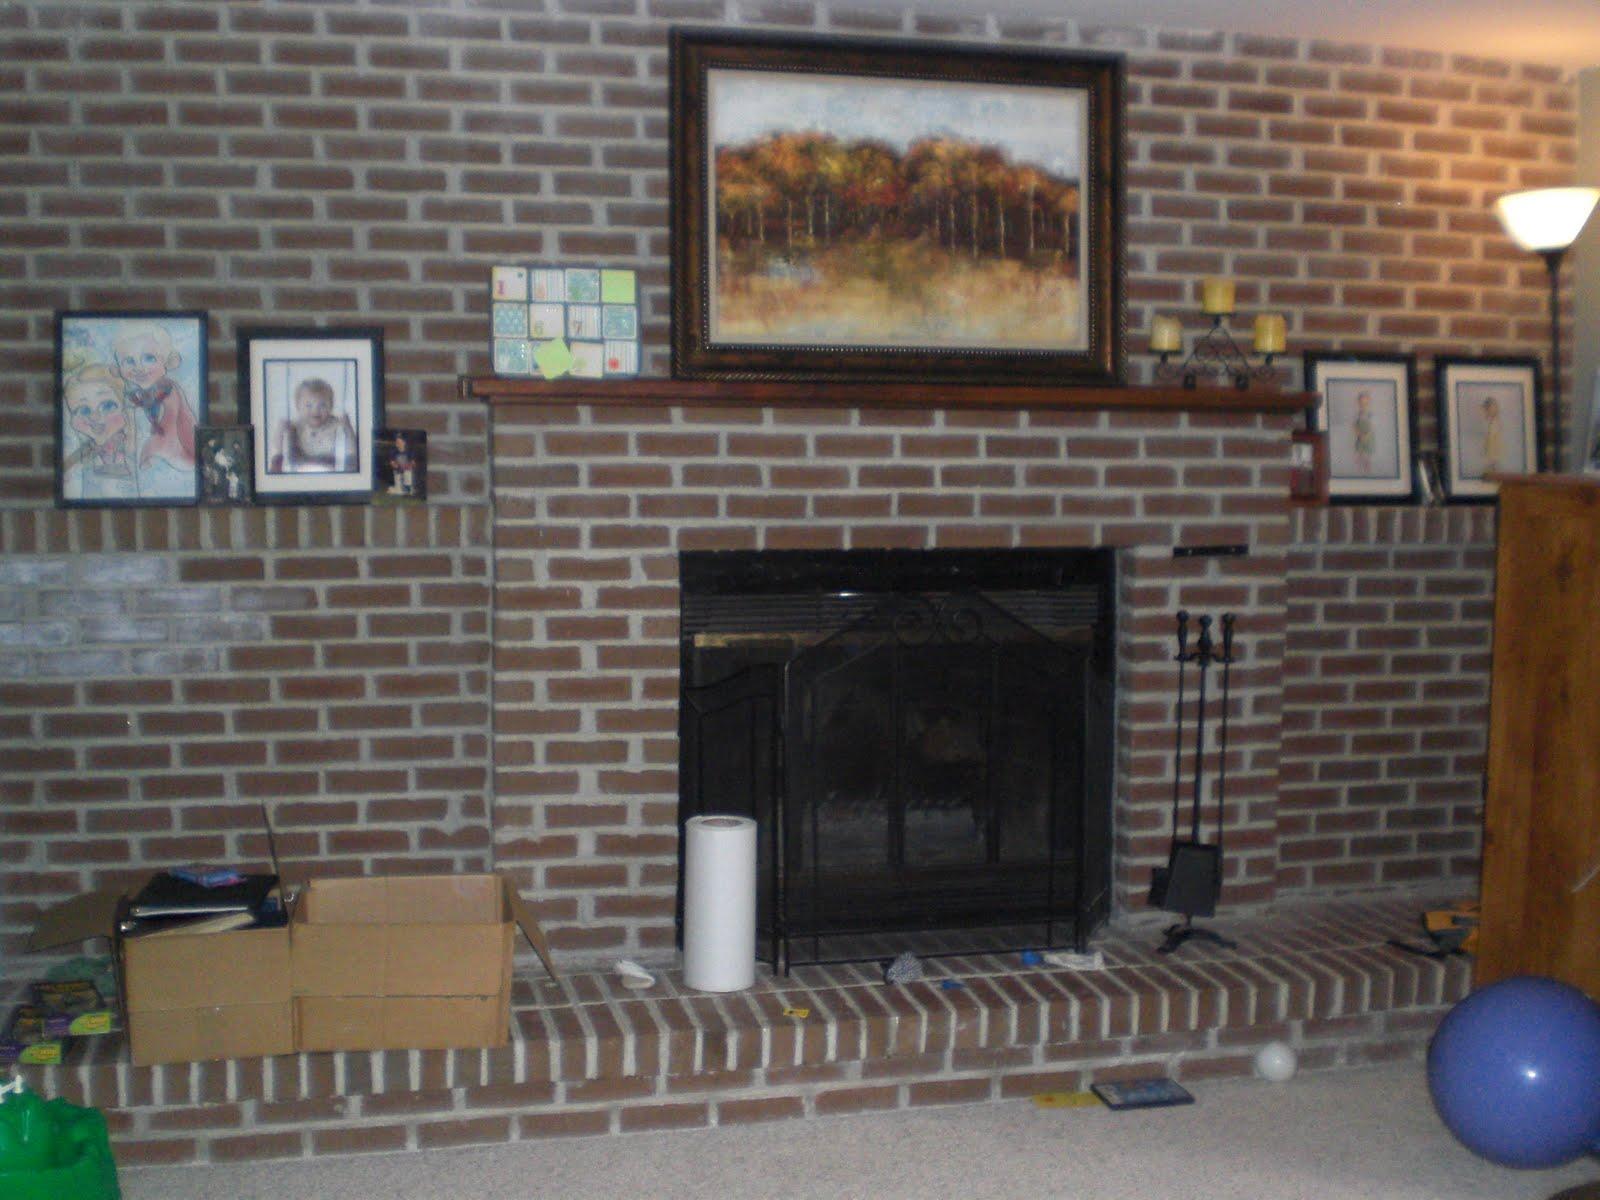 DIY Decor: Brick fireplace makeover